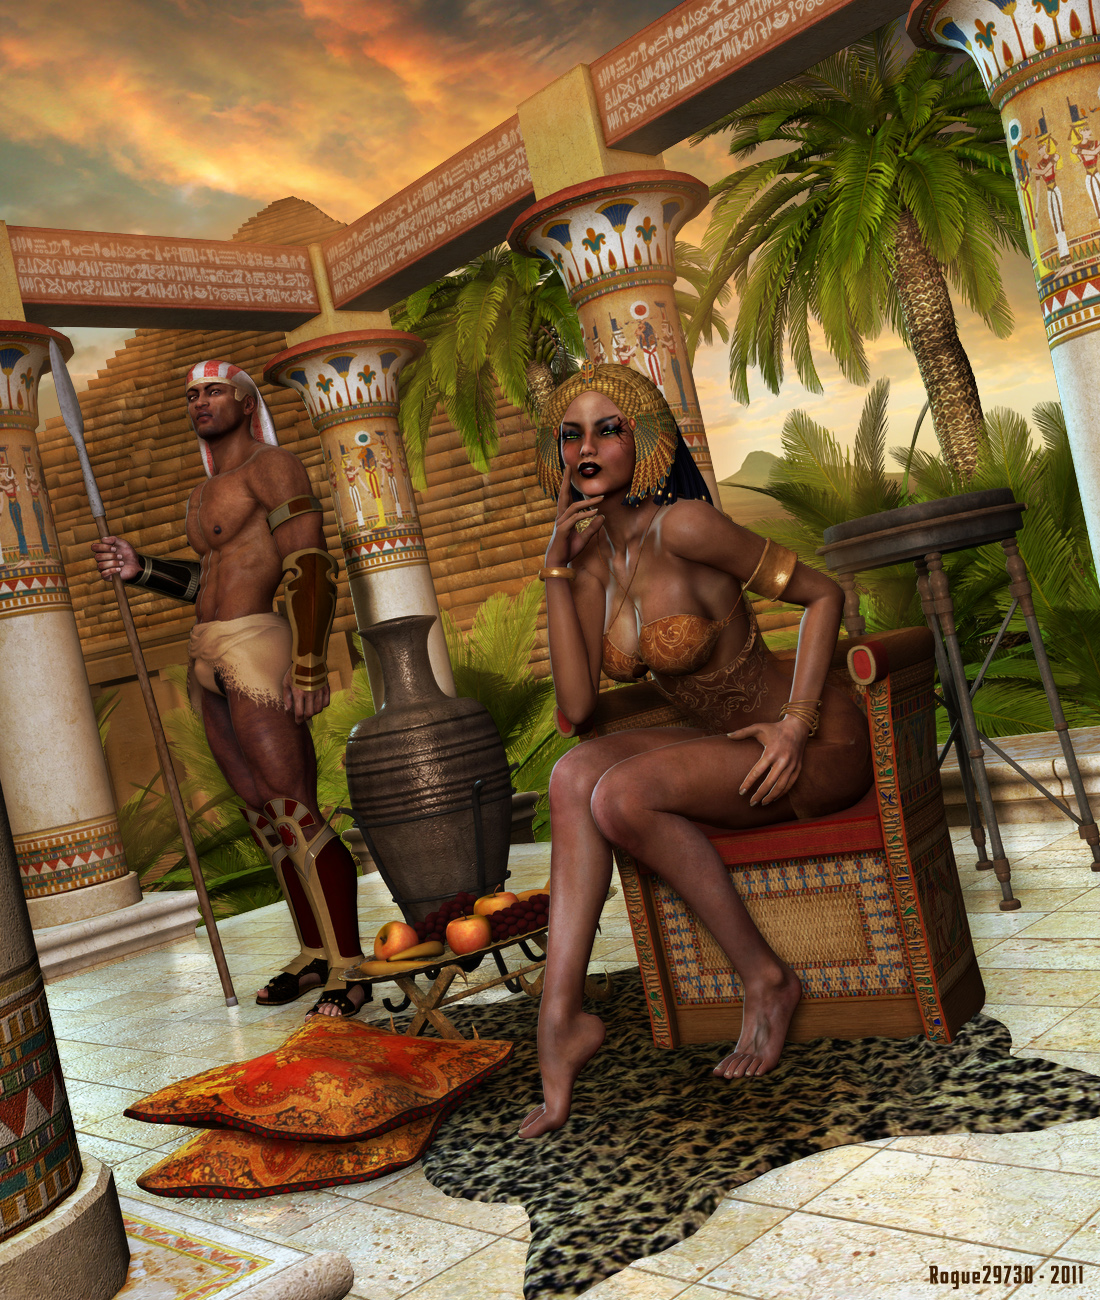 Nude egyptian fantasy art anime video